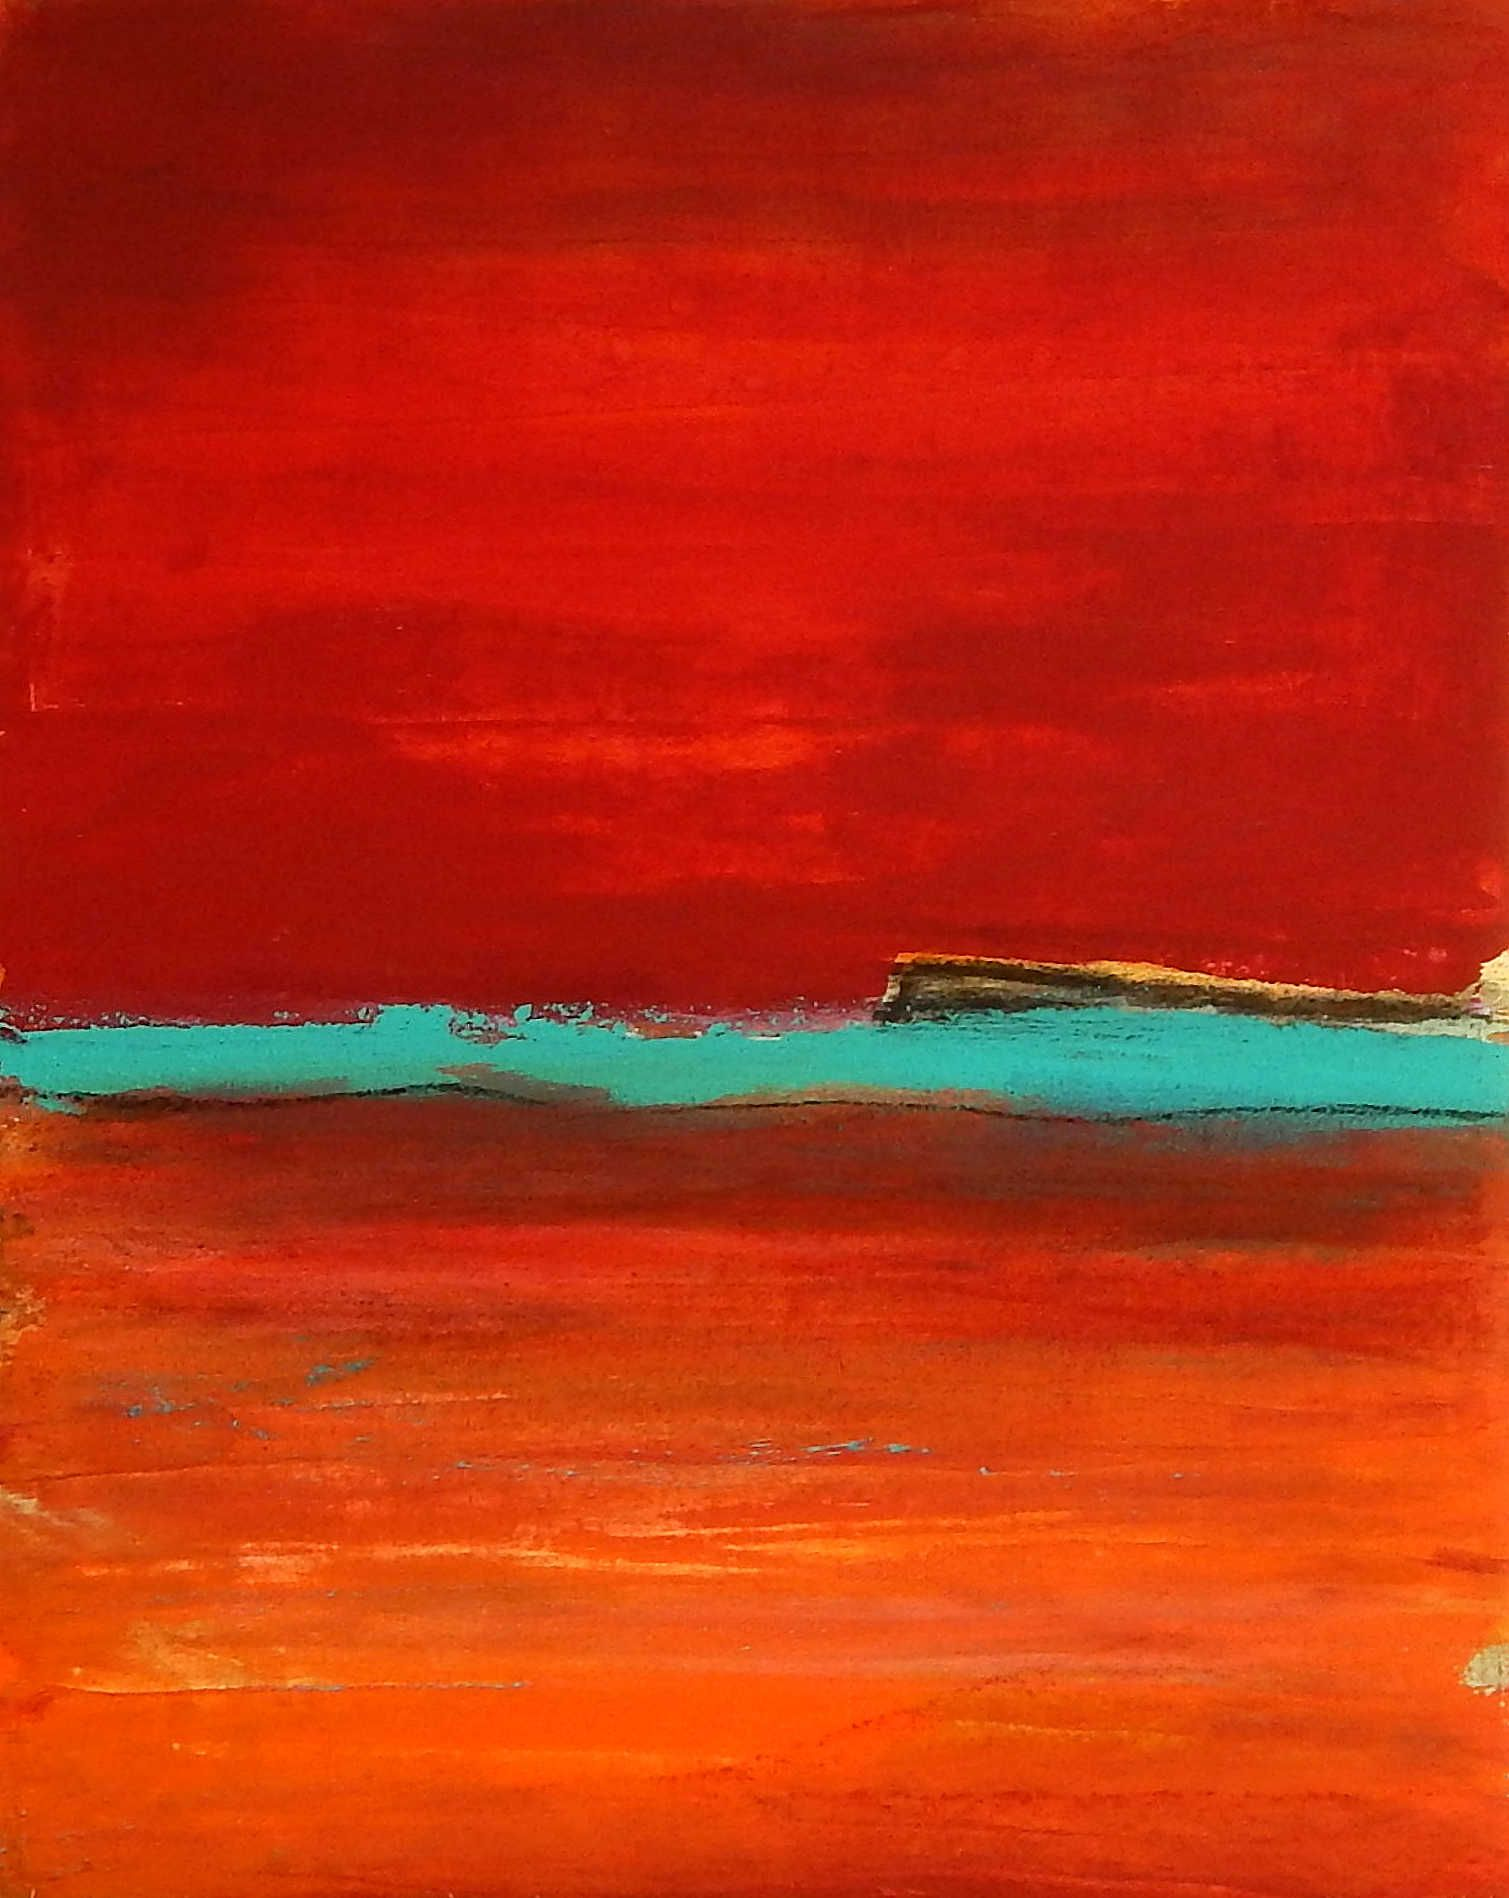 Abstraktes bild orange kunst der malerei malerei abstrakte malerei und malerei kunst - Abstrakte bilder leinwand ...